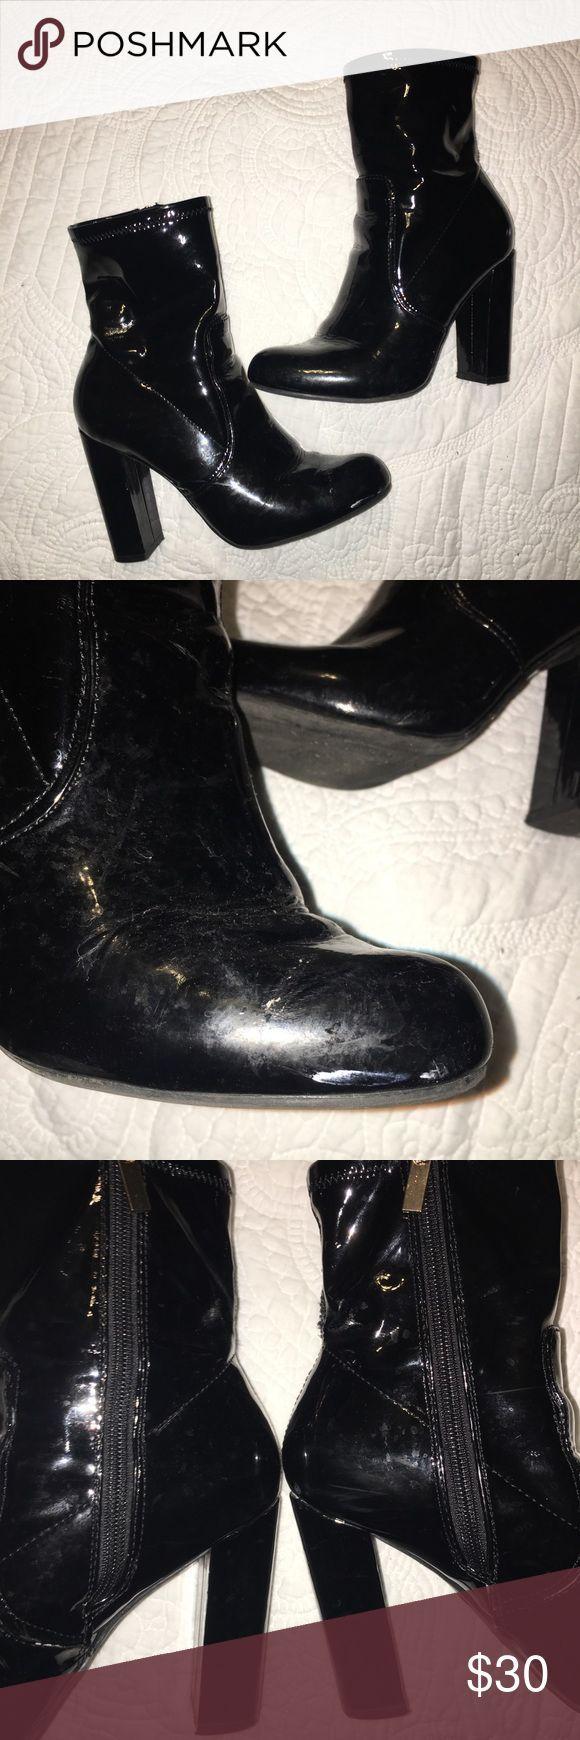 #Black #Bootie #gold #heel #Perfect #Rainboot #Rainy Day Outfit comfy #shiny #Zipper Rainboot Heel Bootie- 6.5 Used shiny black with gold zipper rainboot. Perfect to...        Rainboot Heel Bootie- 6.5ゴールドのジッパーを備えた光沢のある黒のレインブーツ。雨の日の服装に最適です!一日中快適に着こなせます。小さな摩耗傷ローラシューティークシューズアンクルブーツ&ブーティ #rainydayoutfitforwork